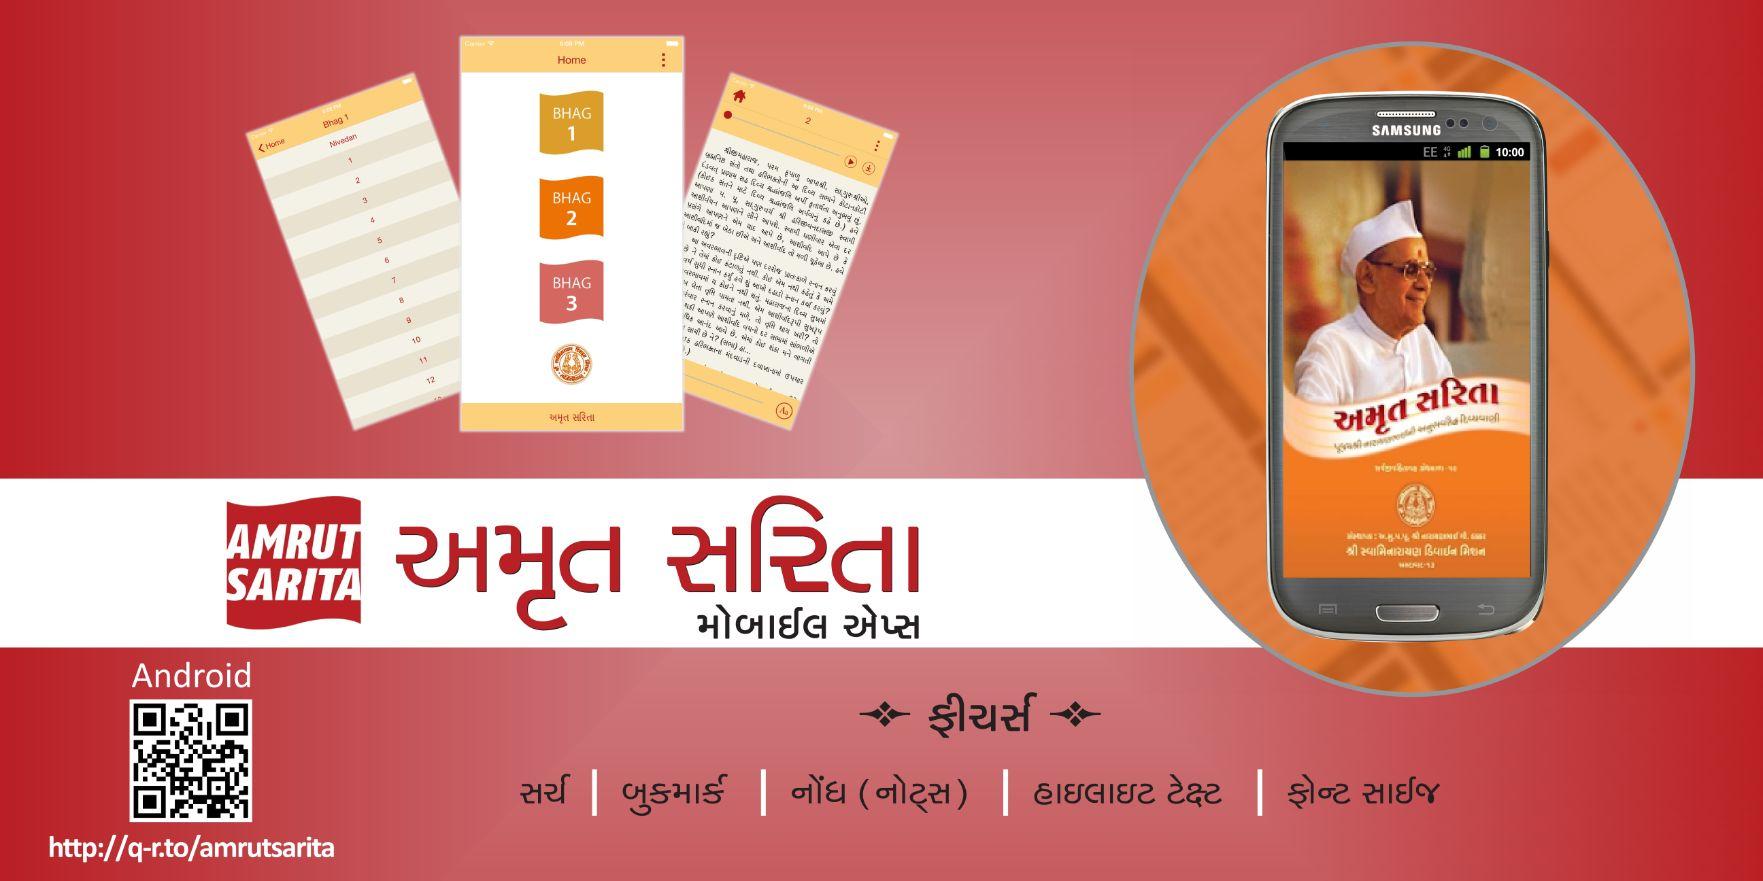 Amrut Sarita mobile apps – Android & iOS